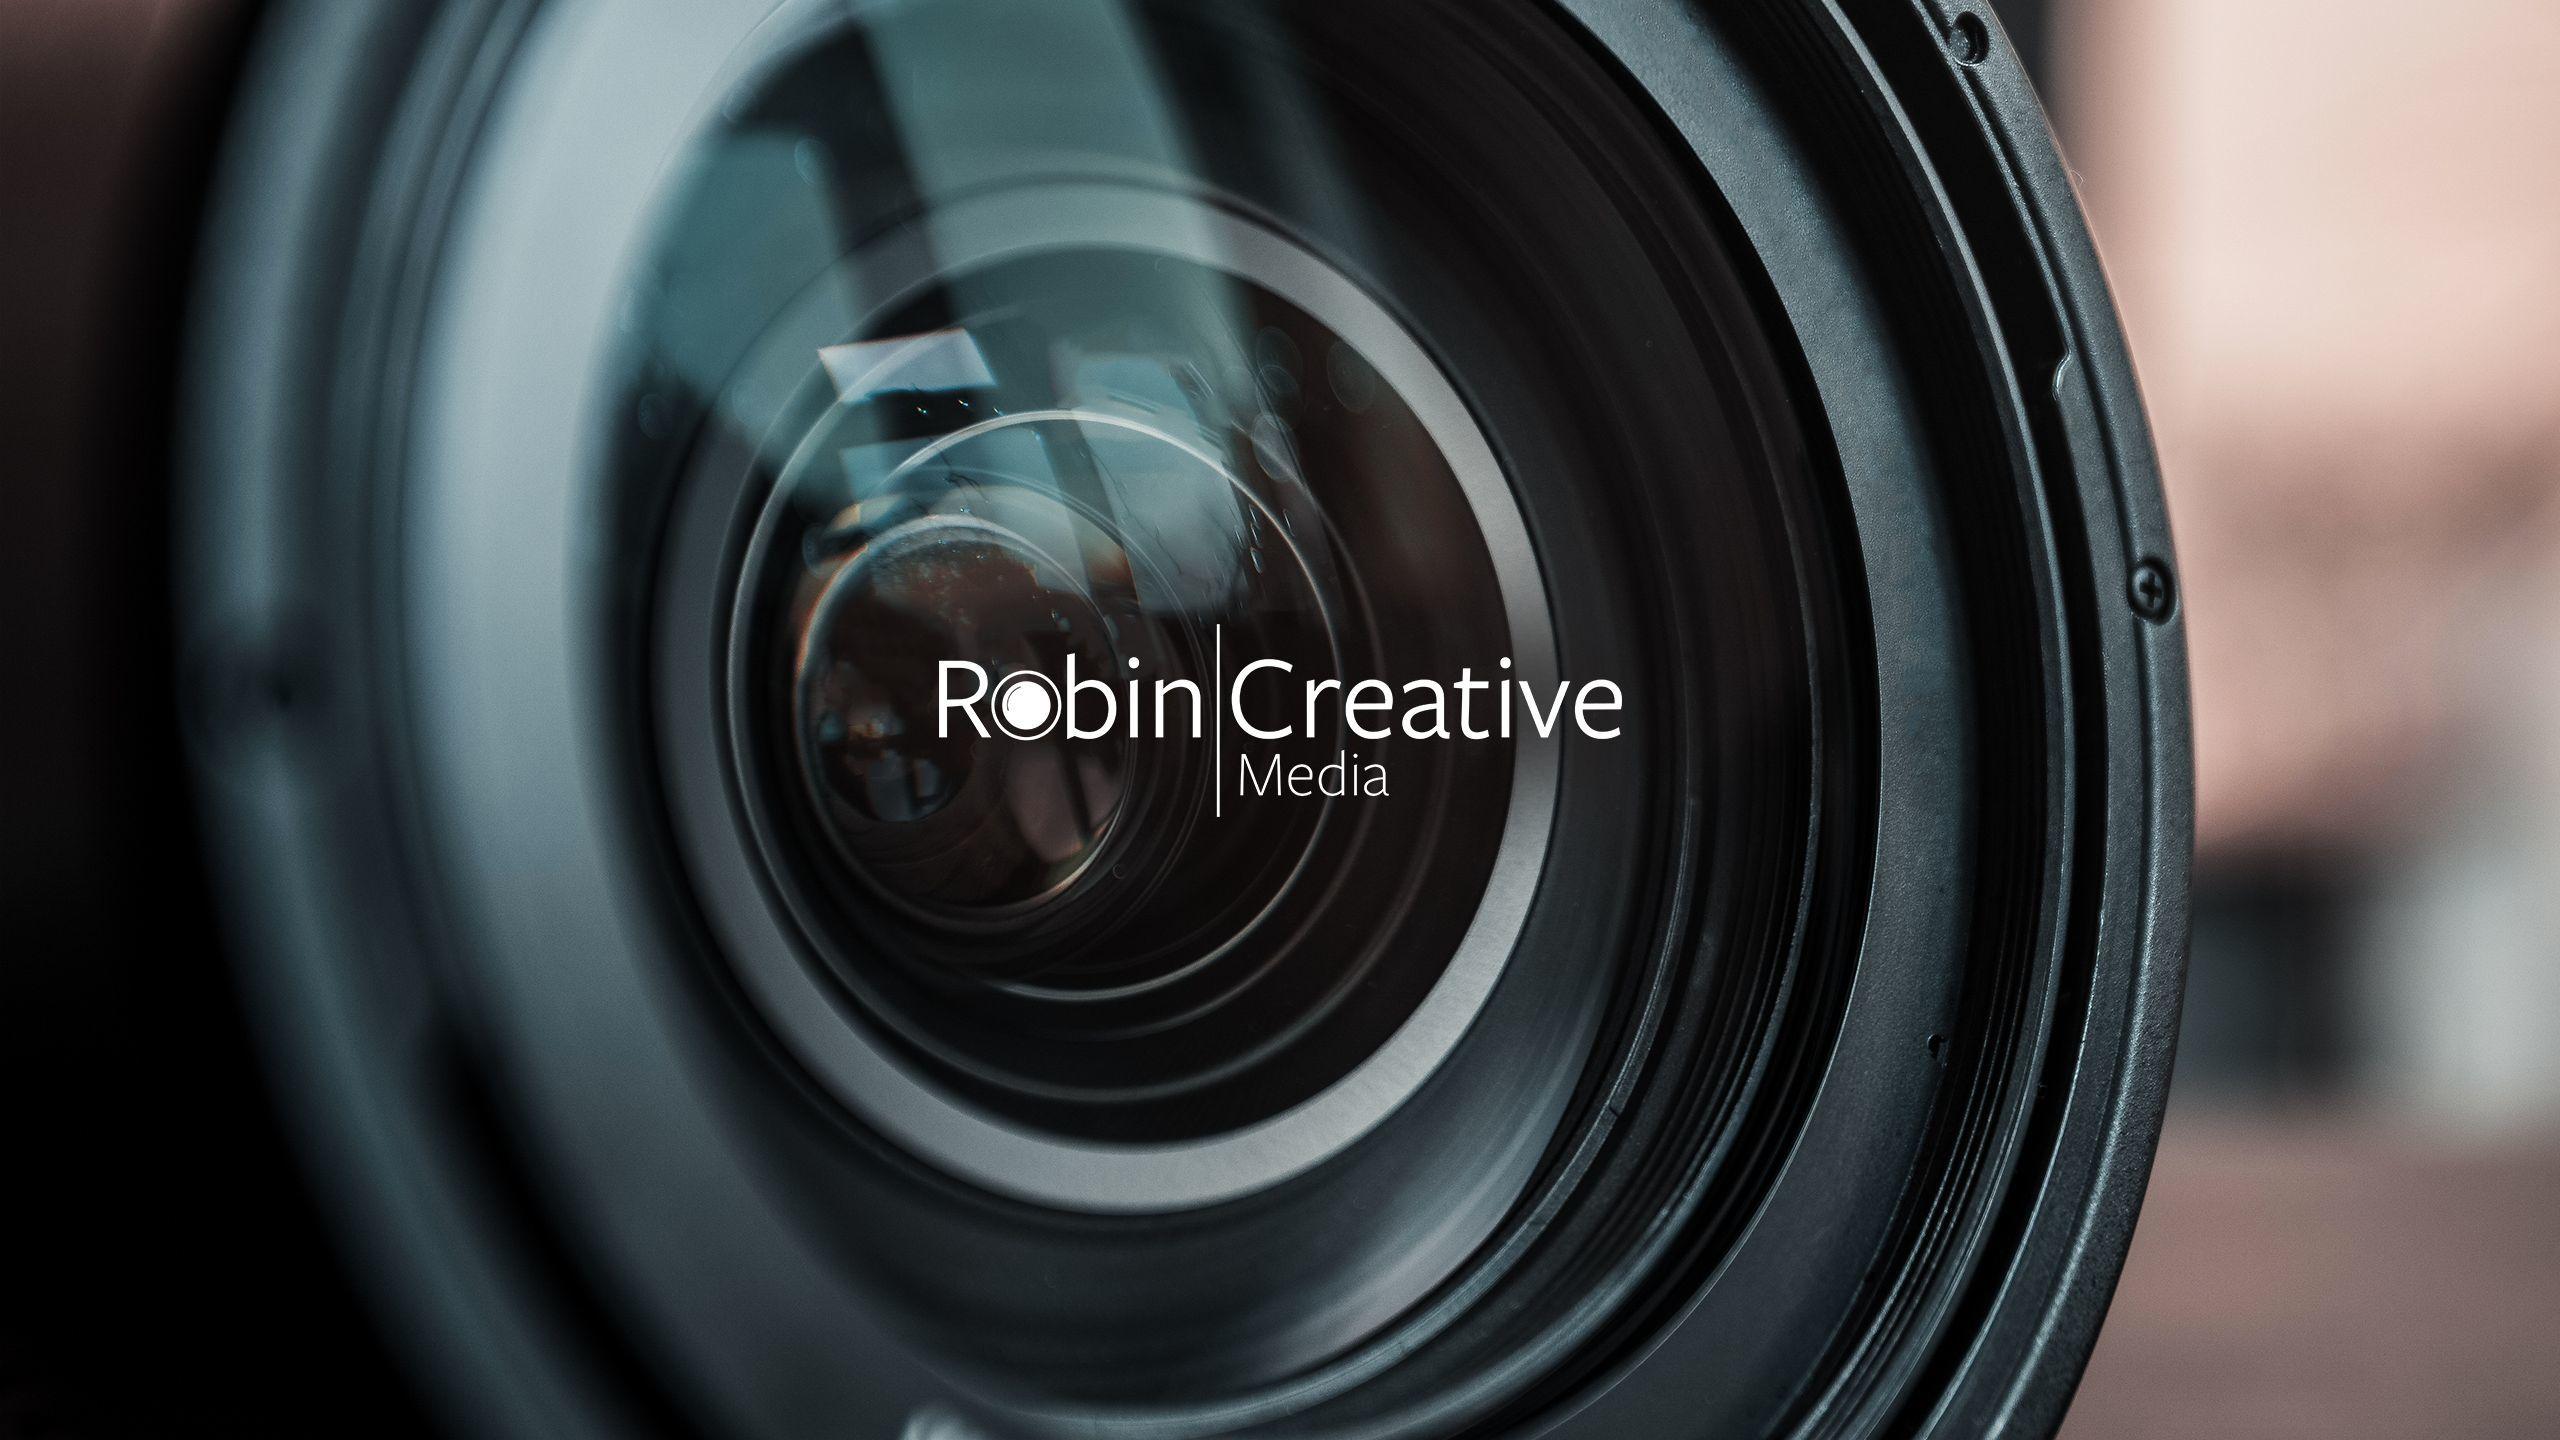 Robin Creative Media Ltd